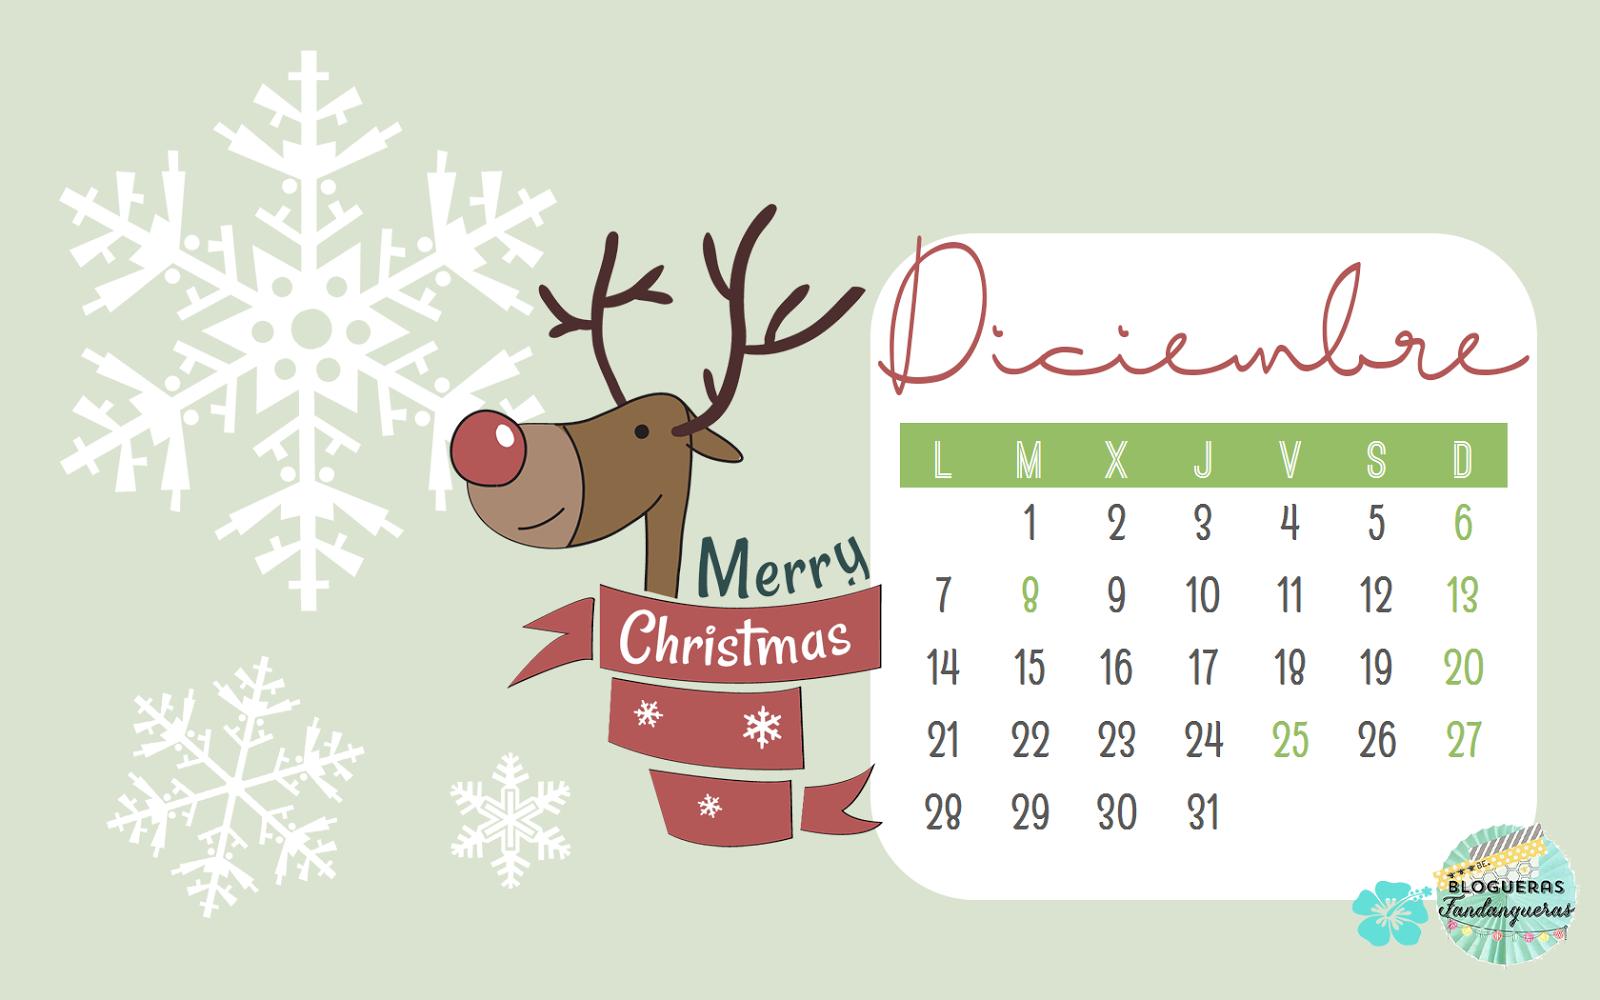 Calendario Mensual Mr Wonderful.Calendario Para Imprimir 2016 Mr Wonderful Calendarios Hd